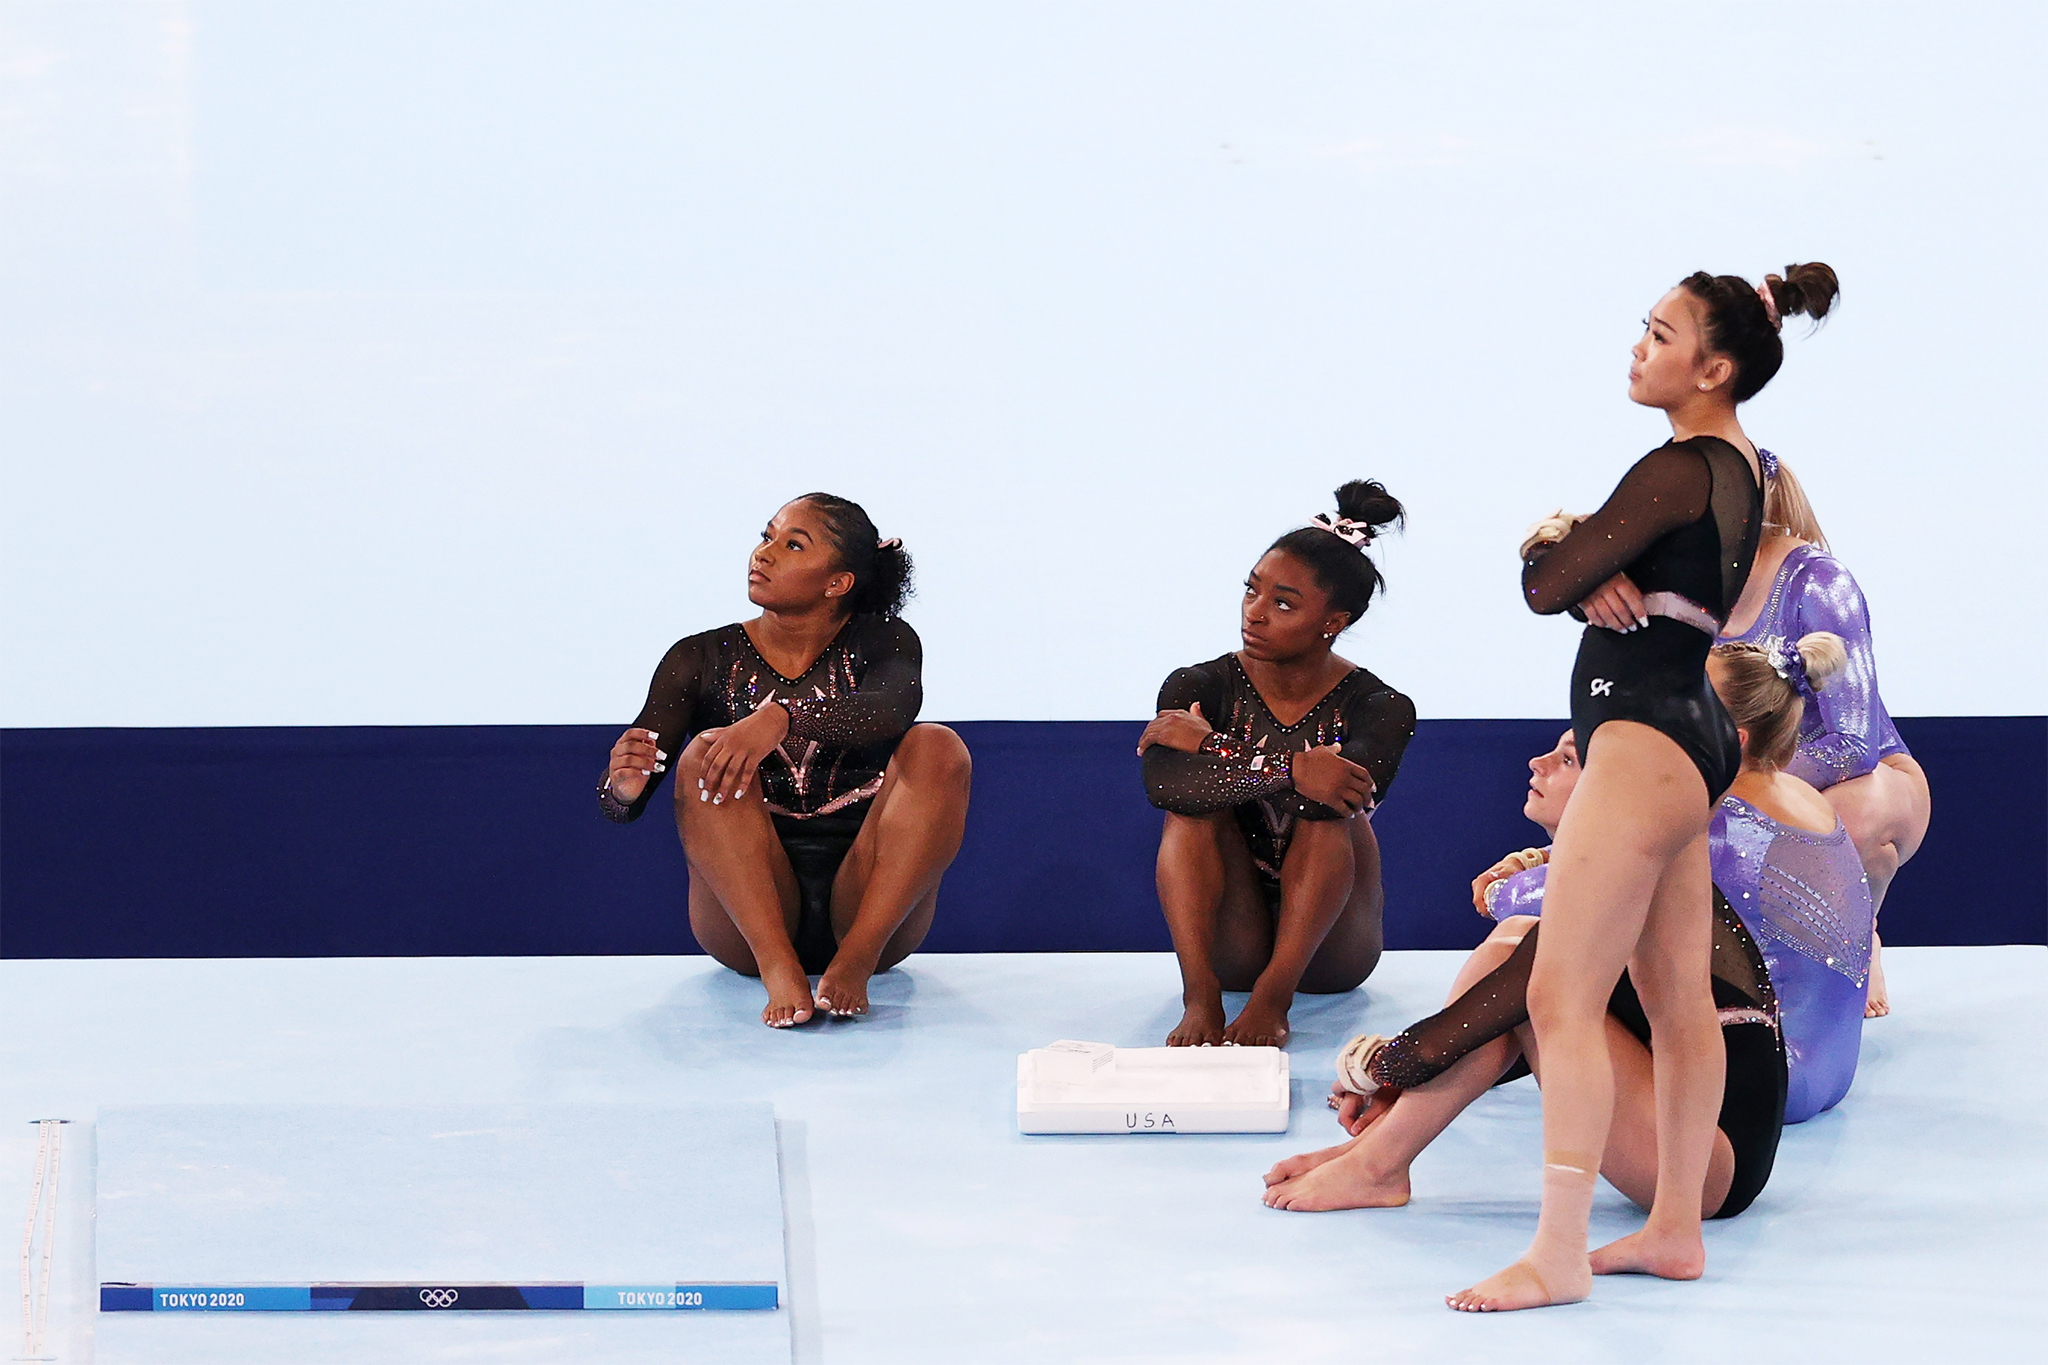 Jordan Chiles, Simone Biles, Grace McCallum, Sunisa Lee (standing), MyKayla Skinner and Jade Carey